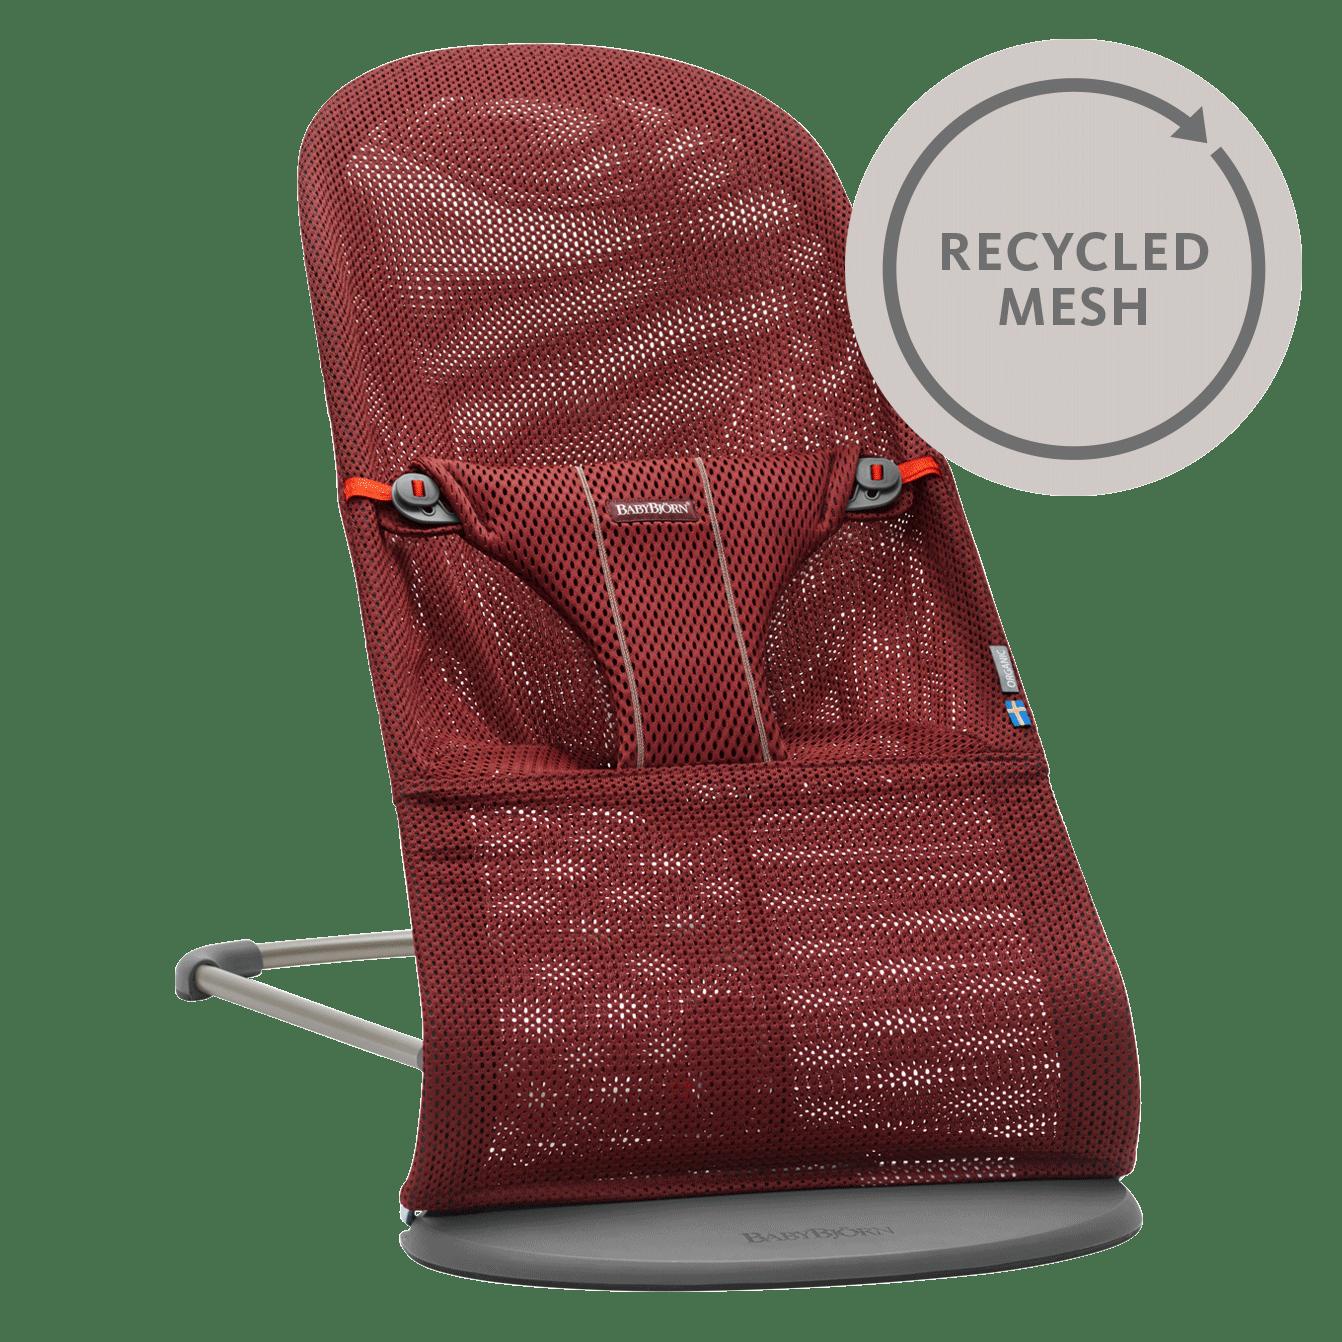 Babywippe Bliss Burgunderrot Recycled-Mesh-006007-BABYBJÖRN